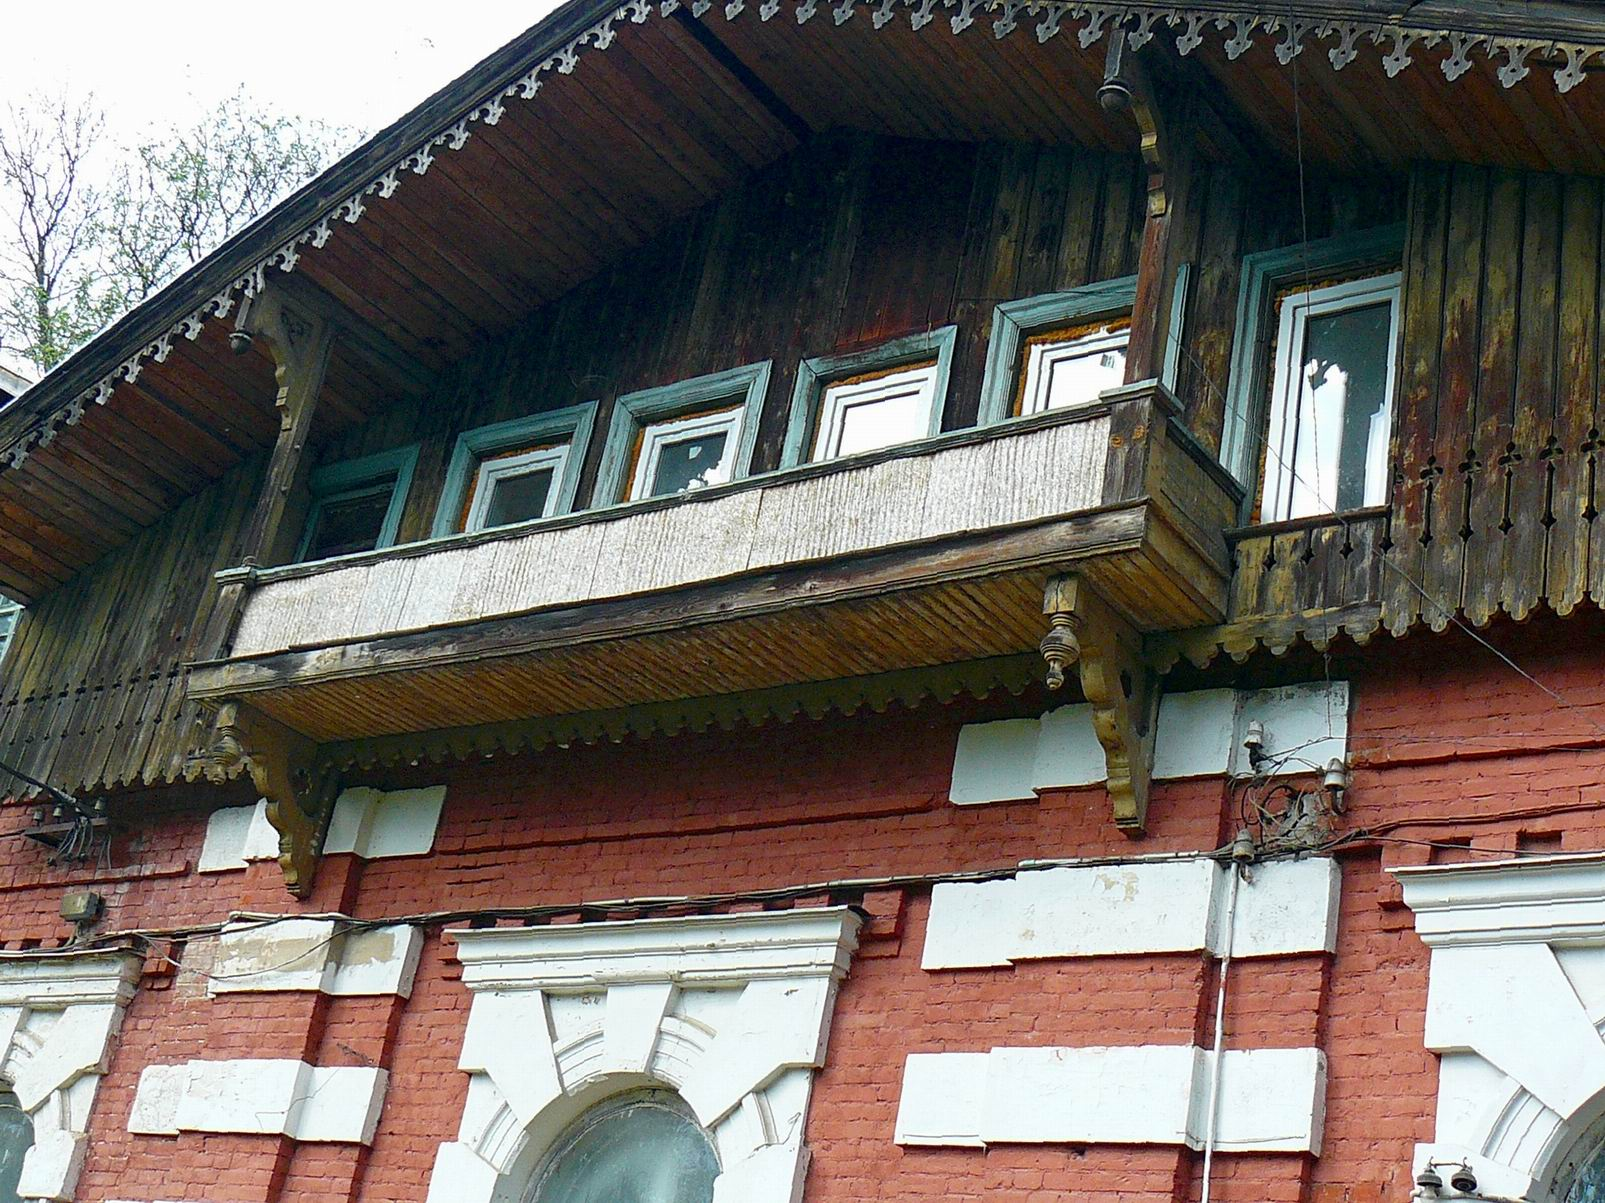 http://pics.livejournal.com/korolew/pic/00016tec